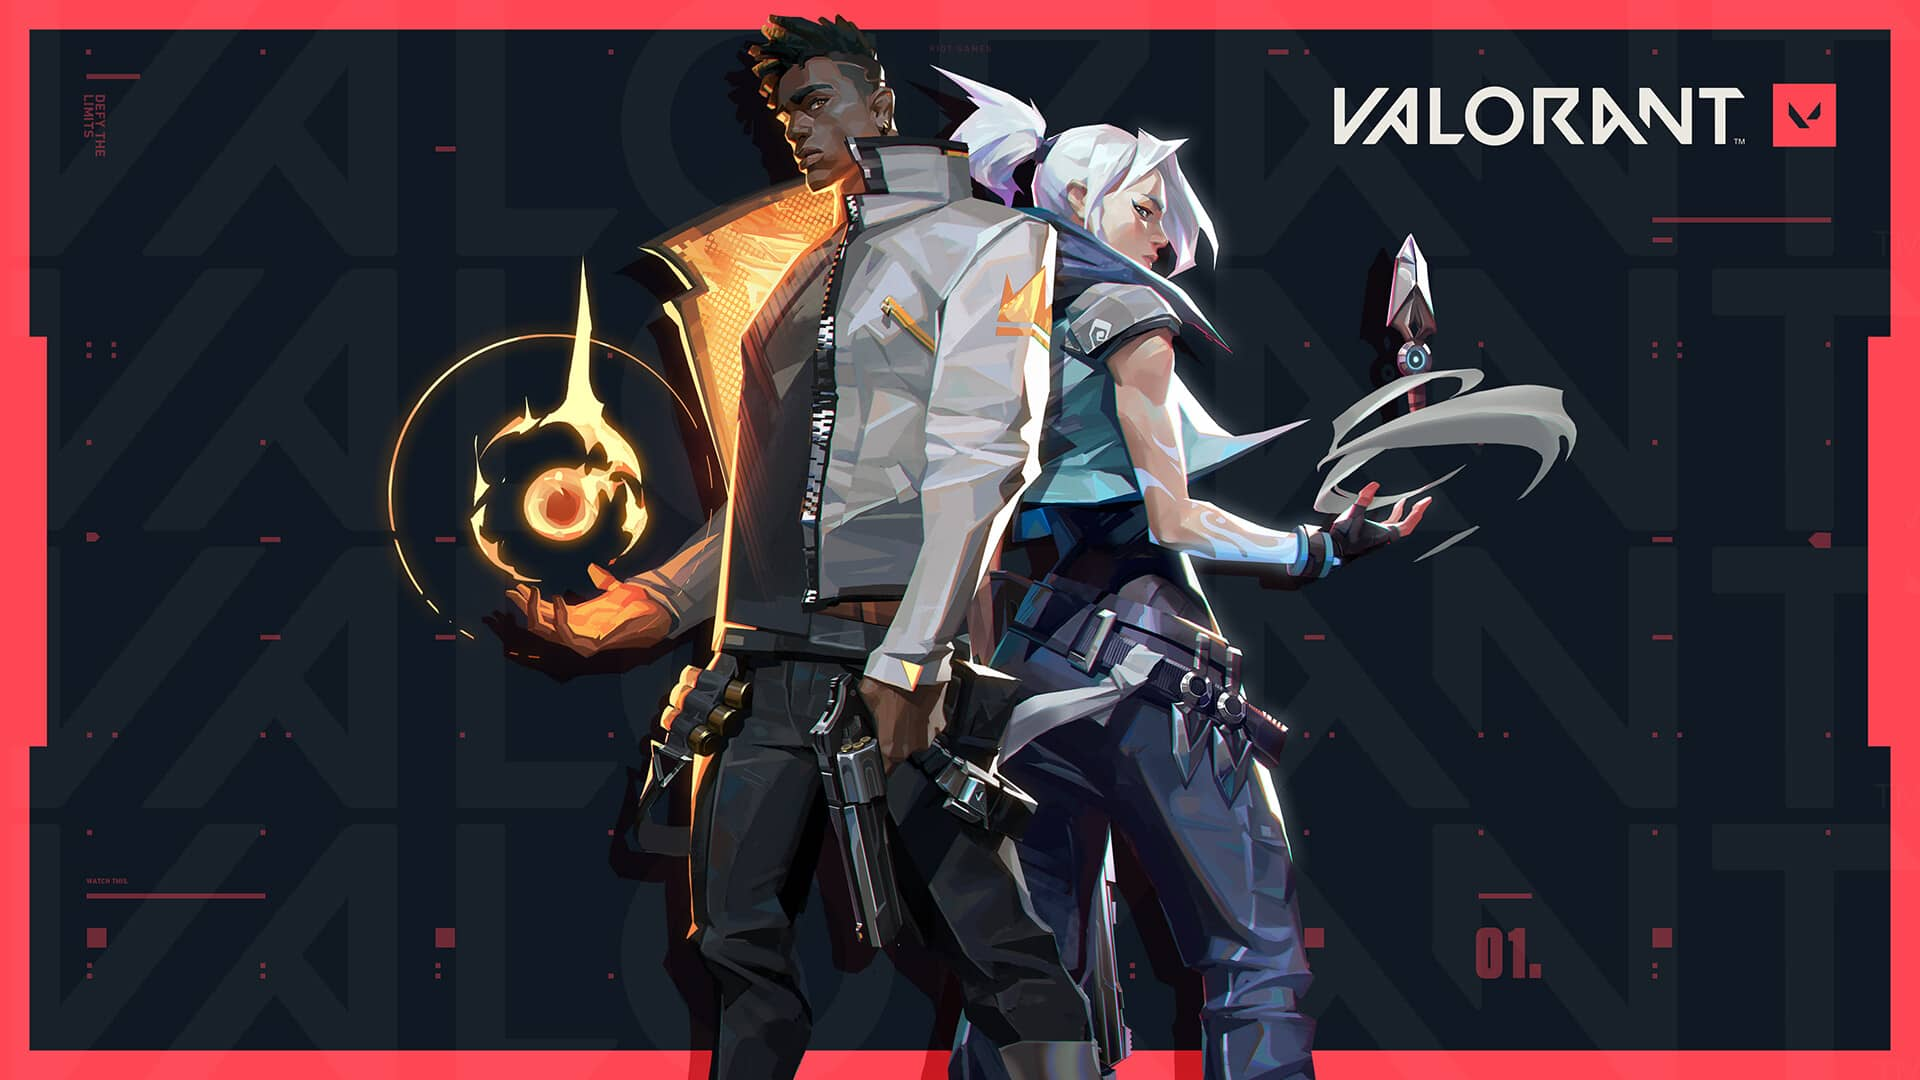 What is Valorant